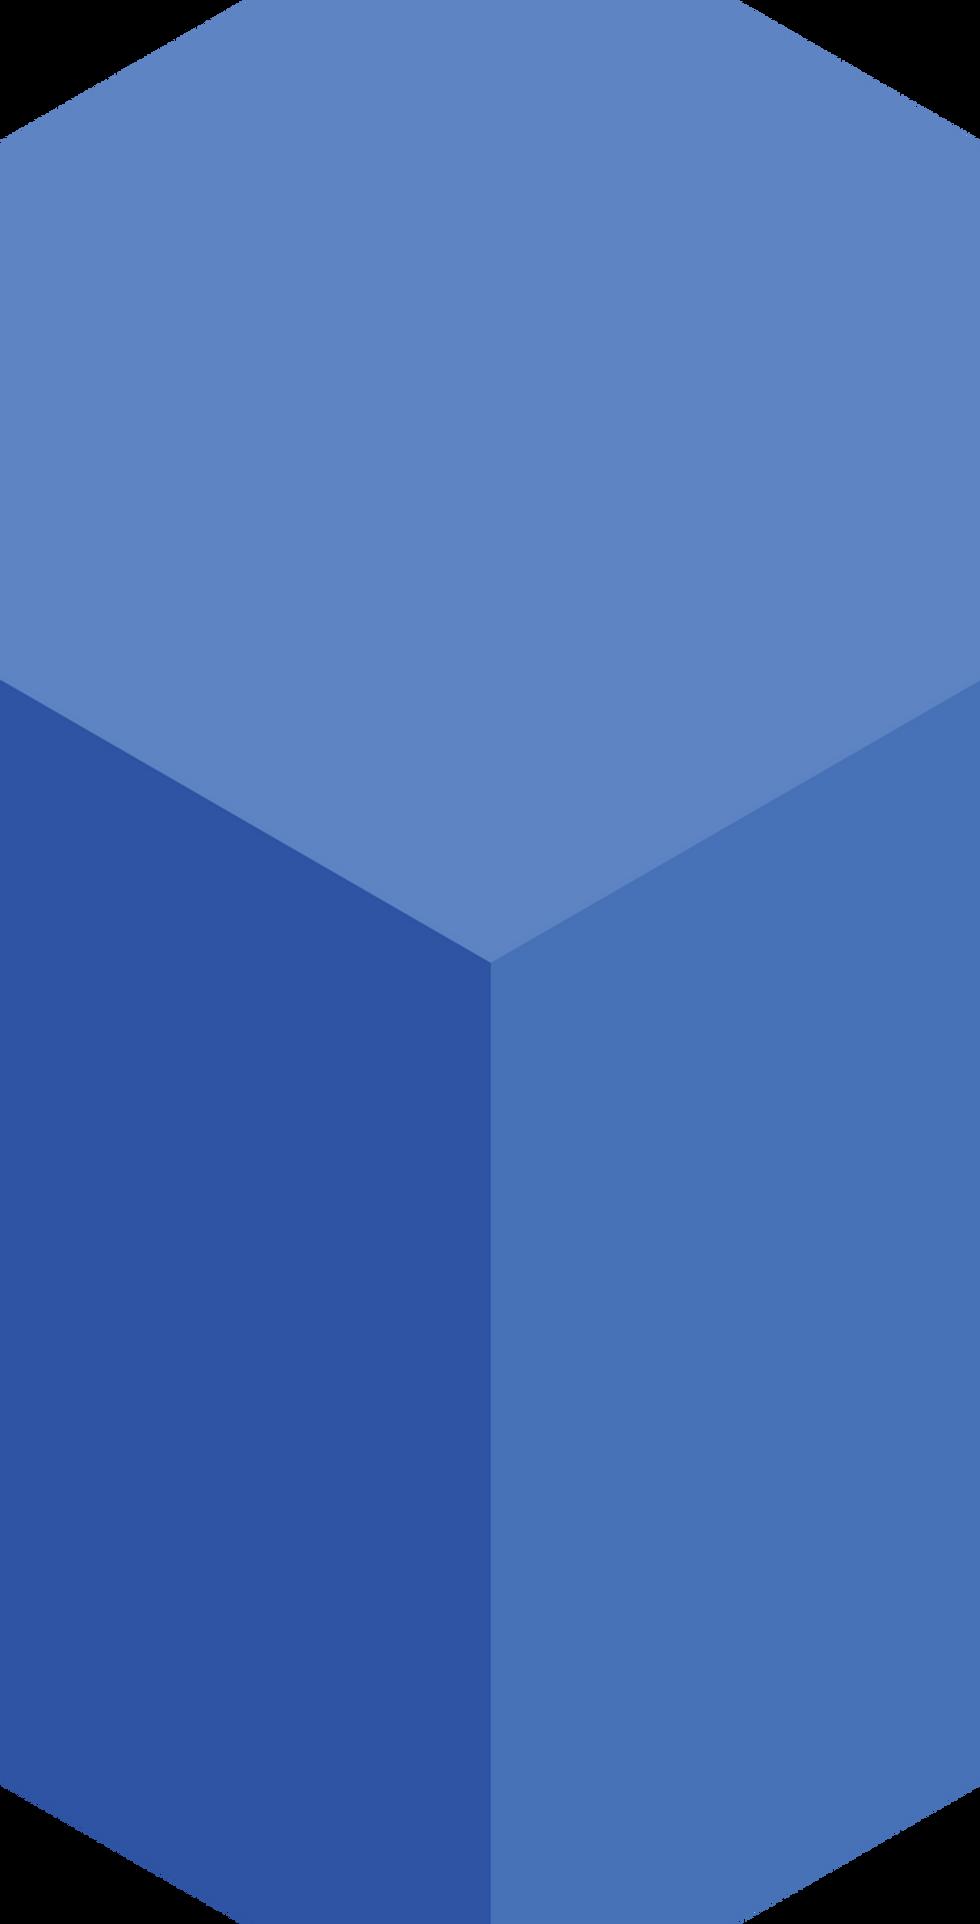 Cubo Impacta Azul.png